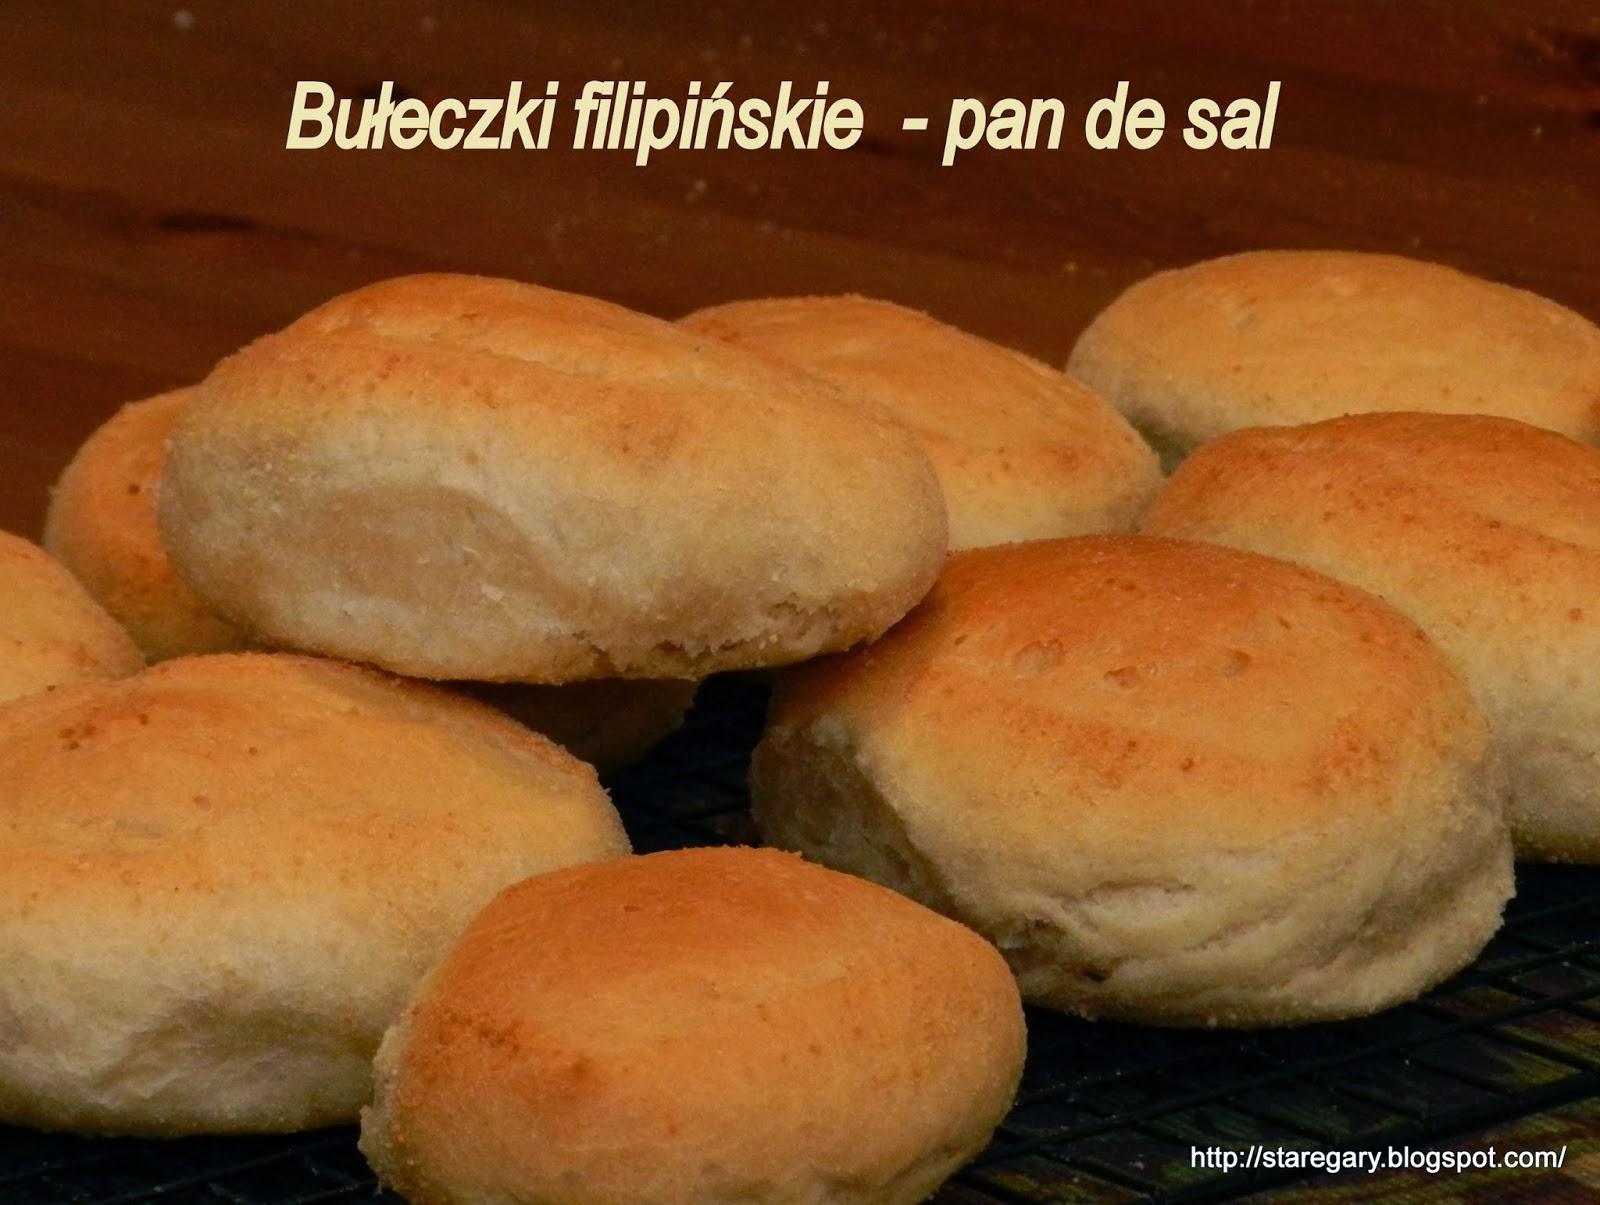 Bułeczki filipińskie  - pan de sal